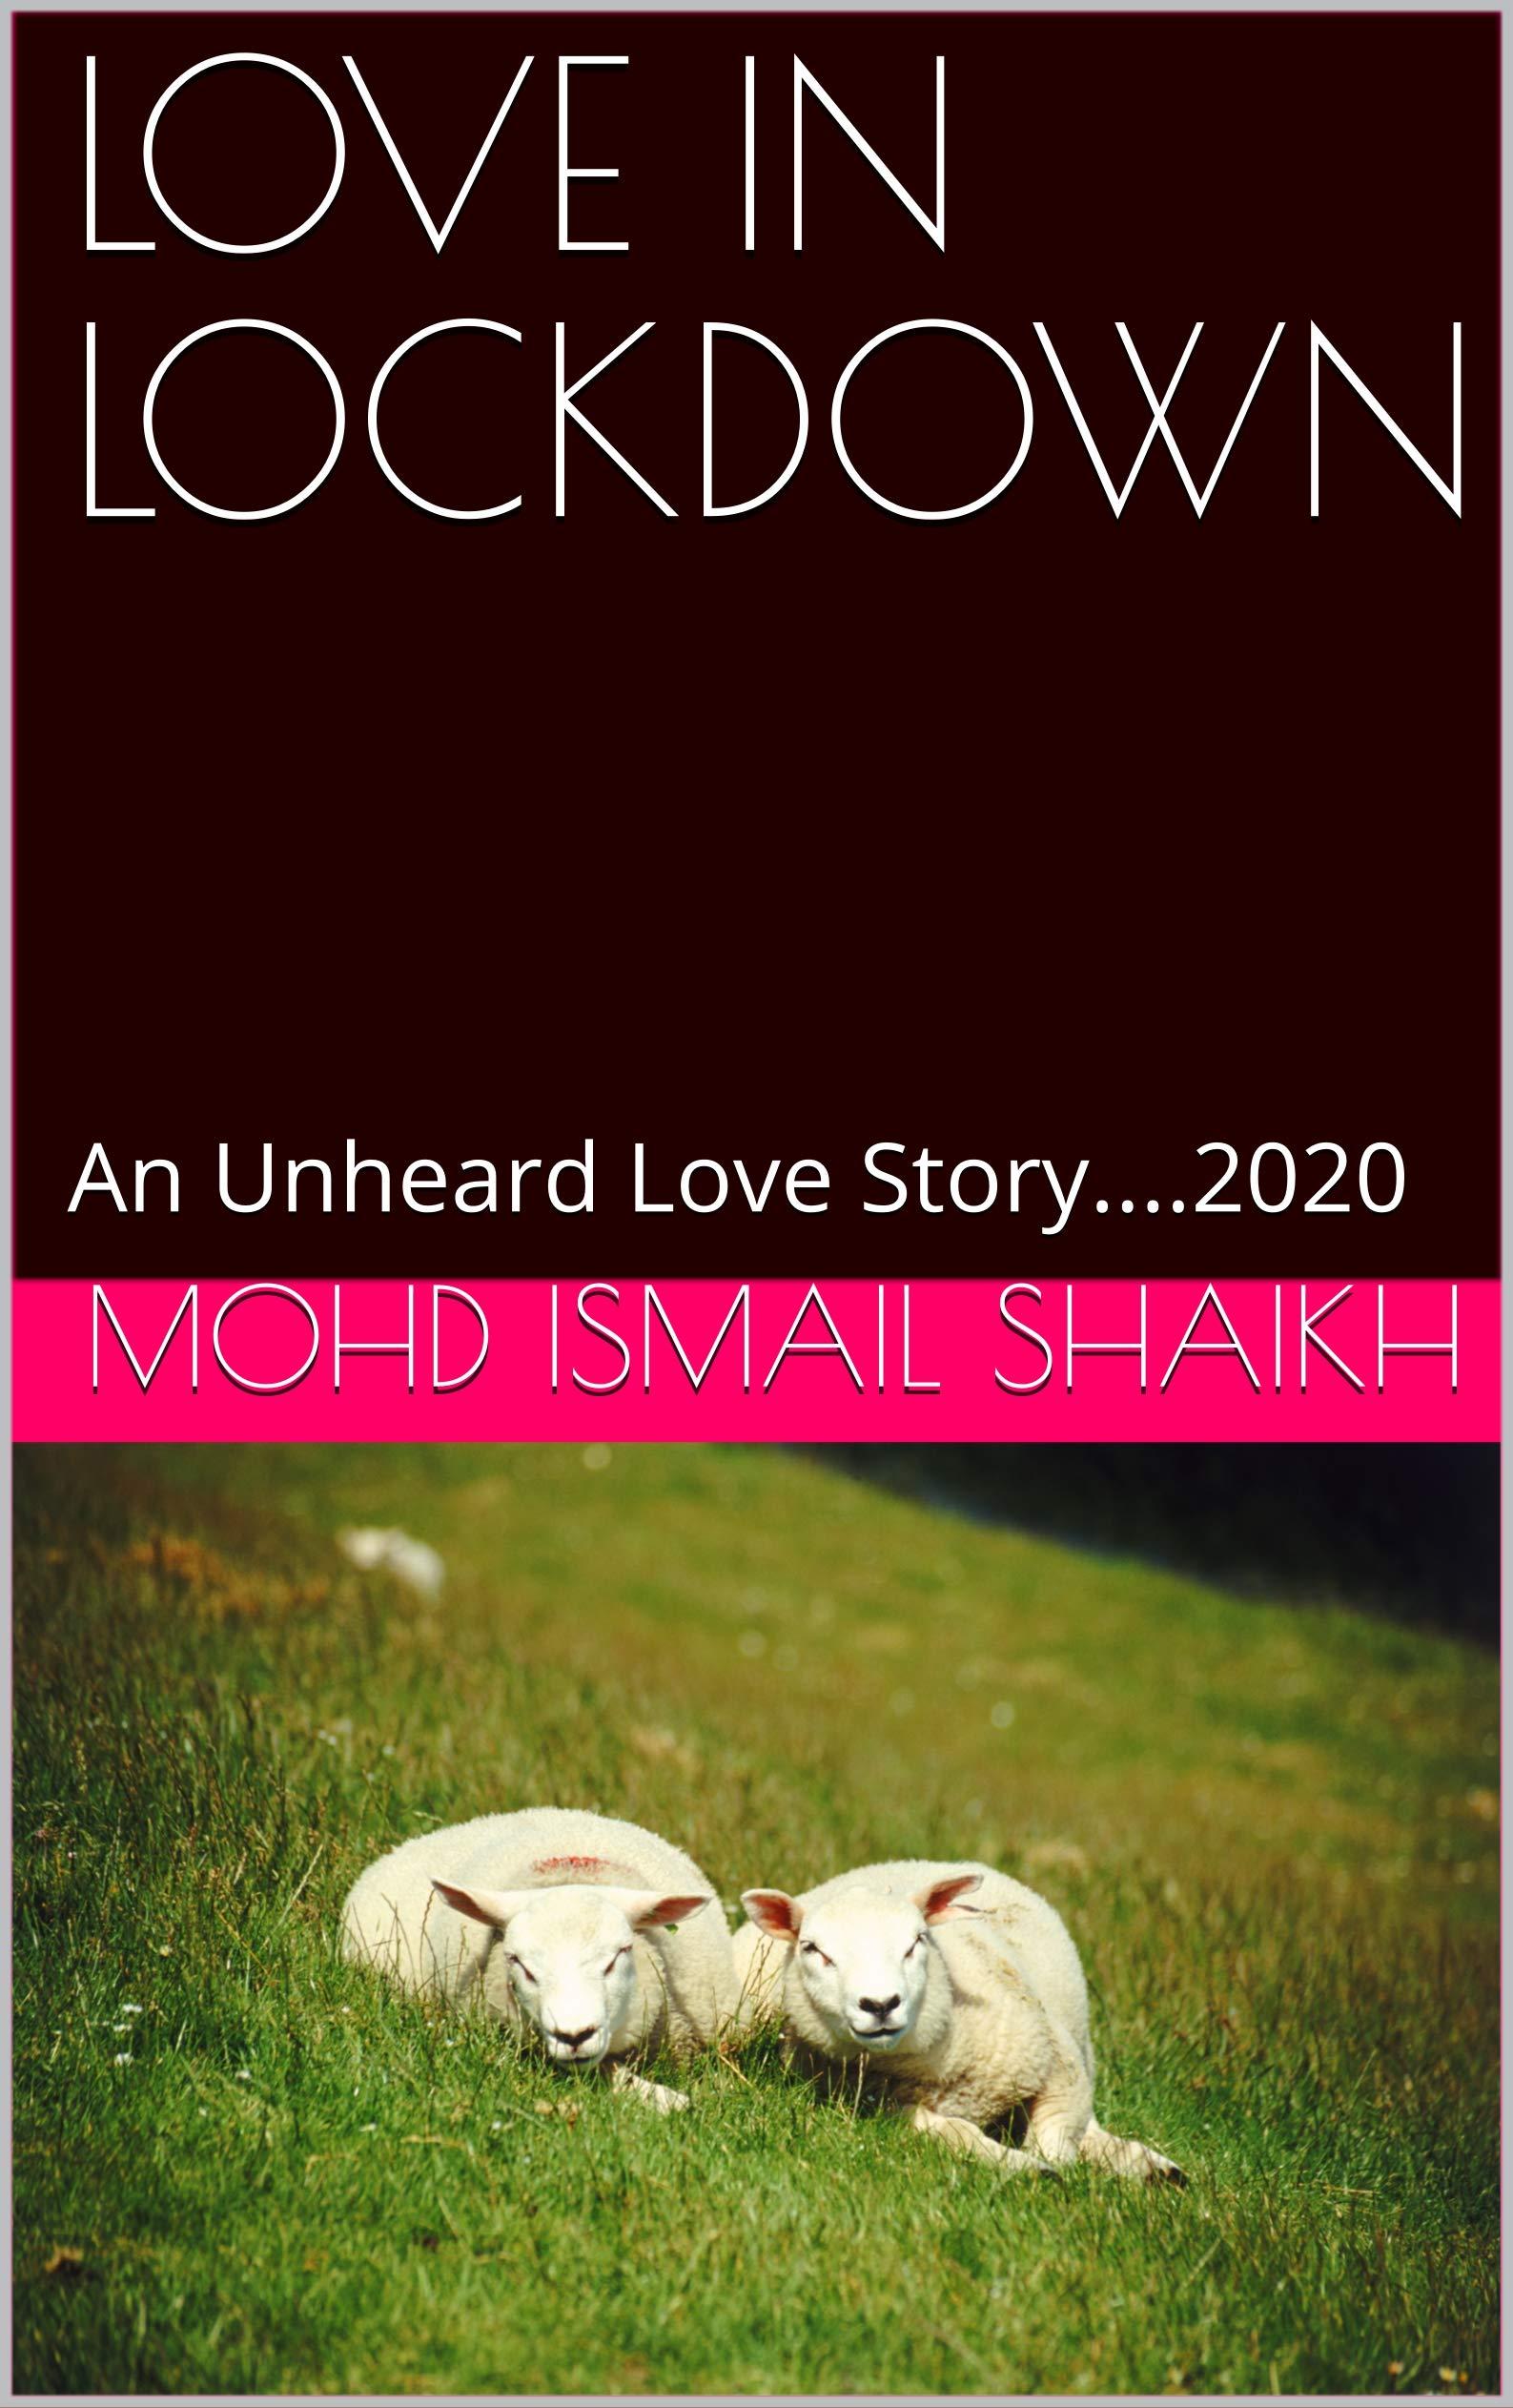 LOVE IN LOCKDOWN: An Unheard Love Story....2020